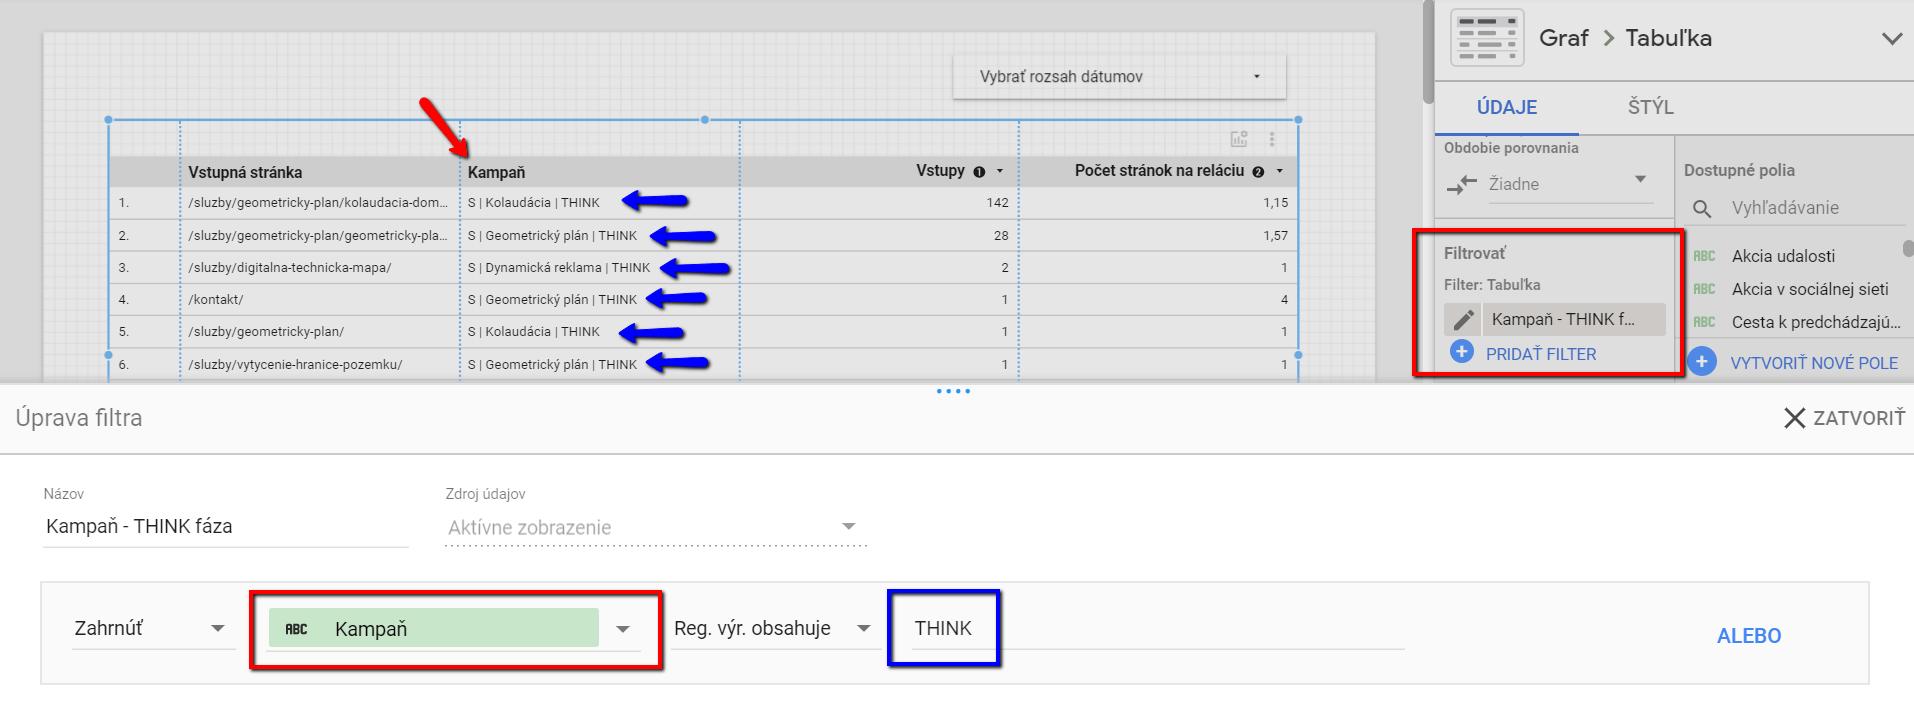 Google Data Studio - filter, nastavenie filtra cez regex, úprava tabuľky, screenshot